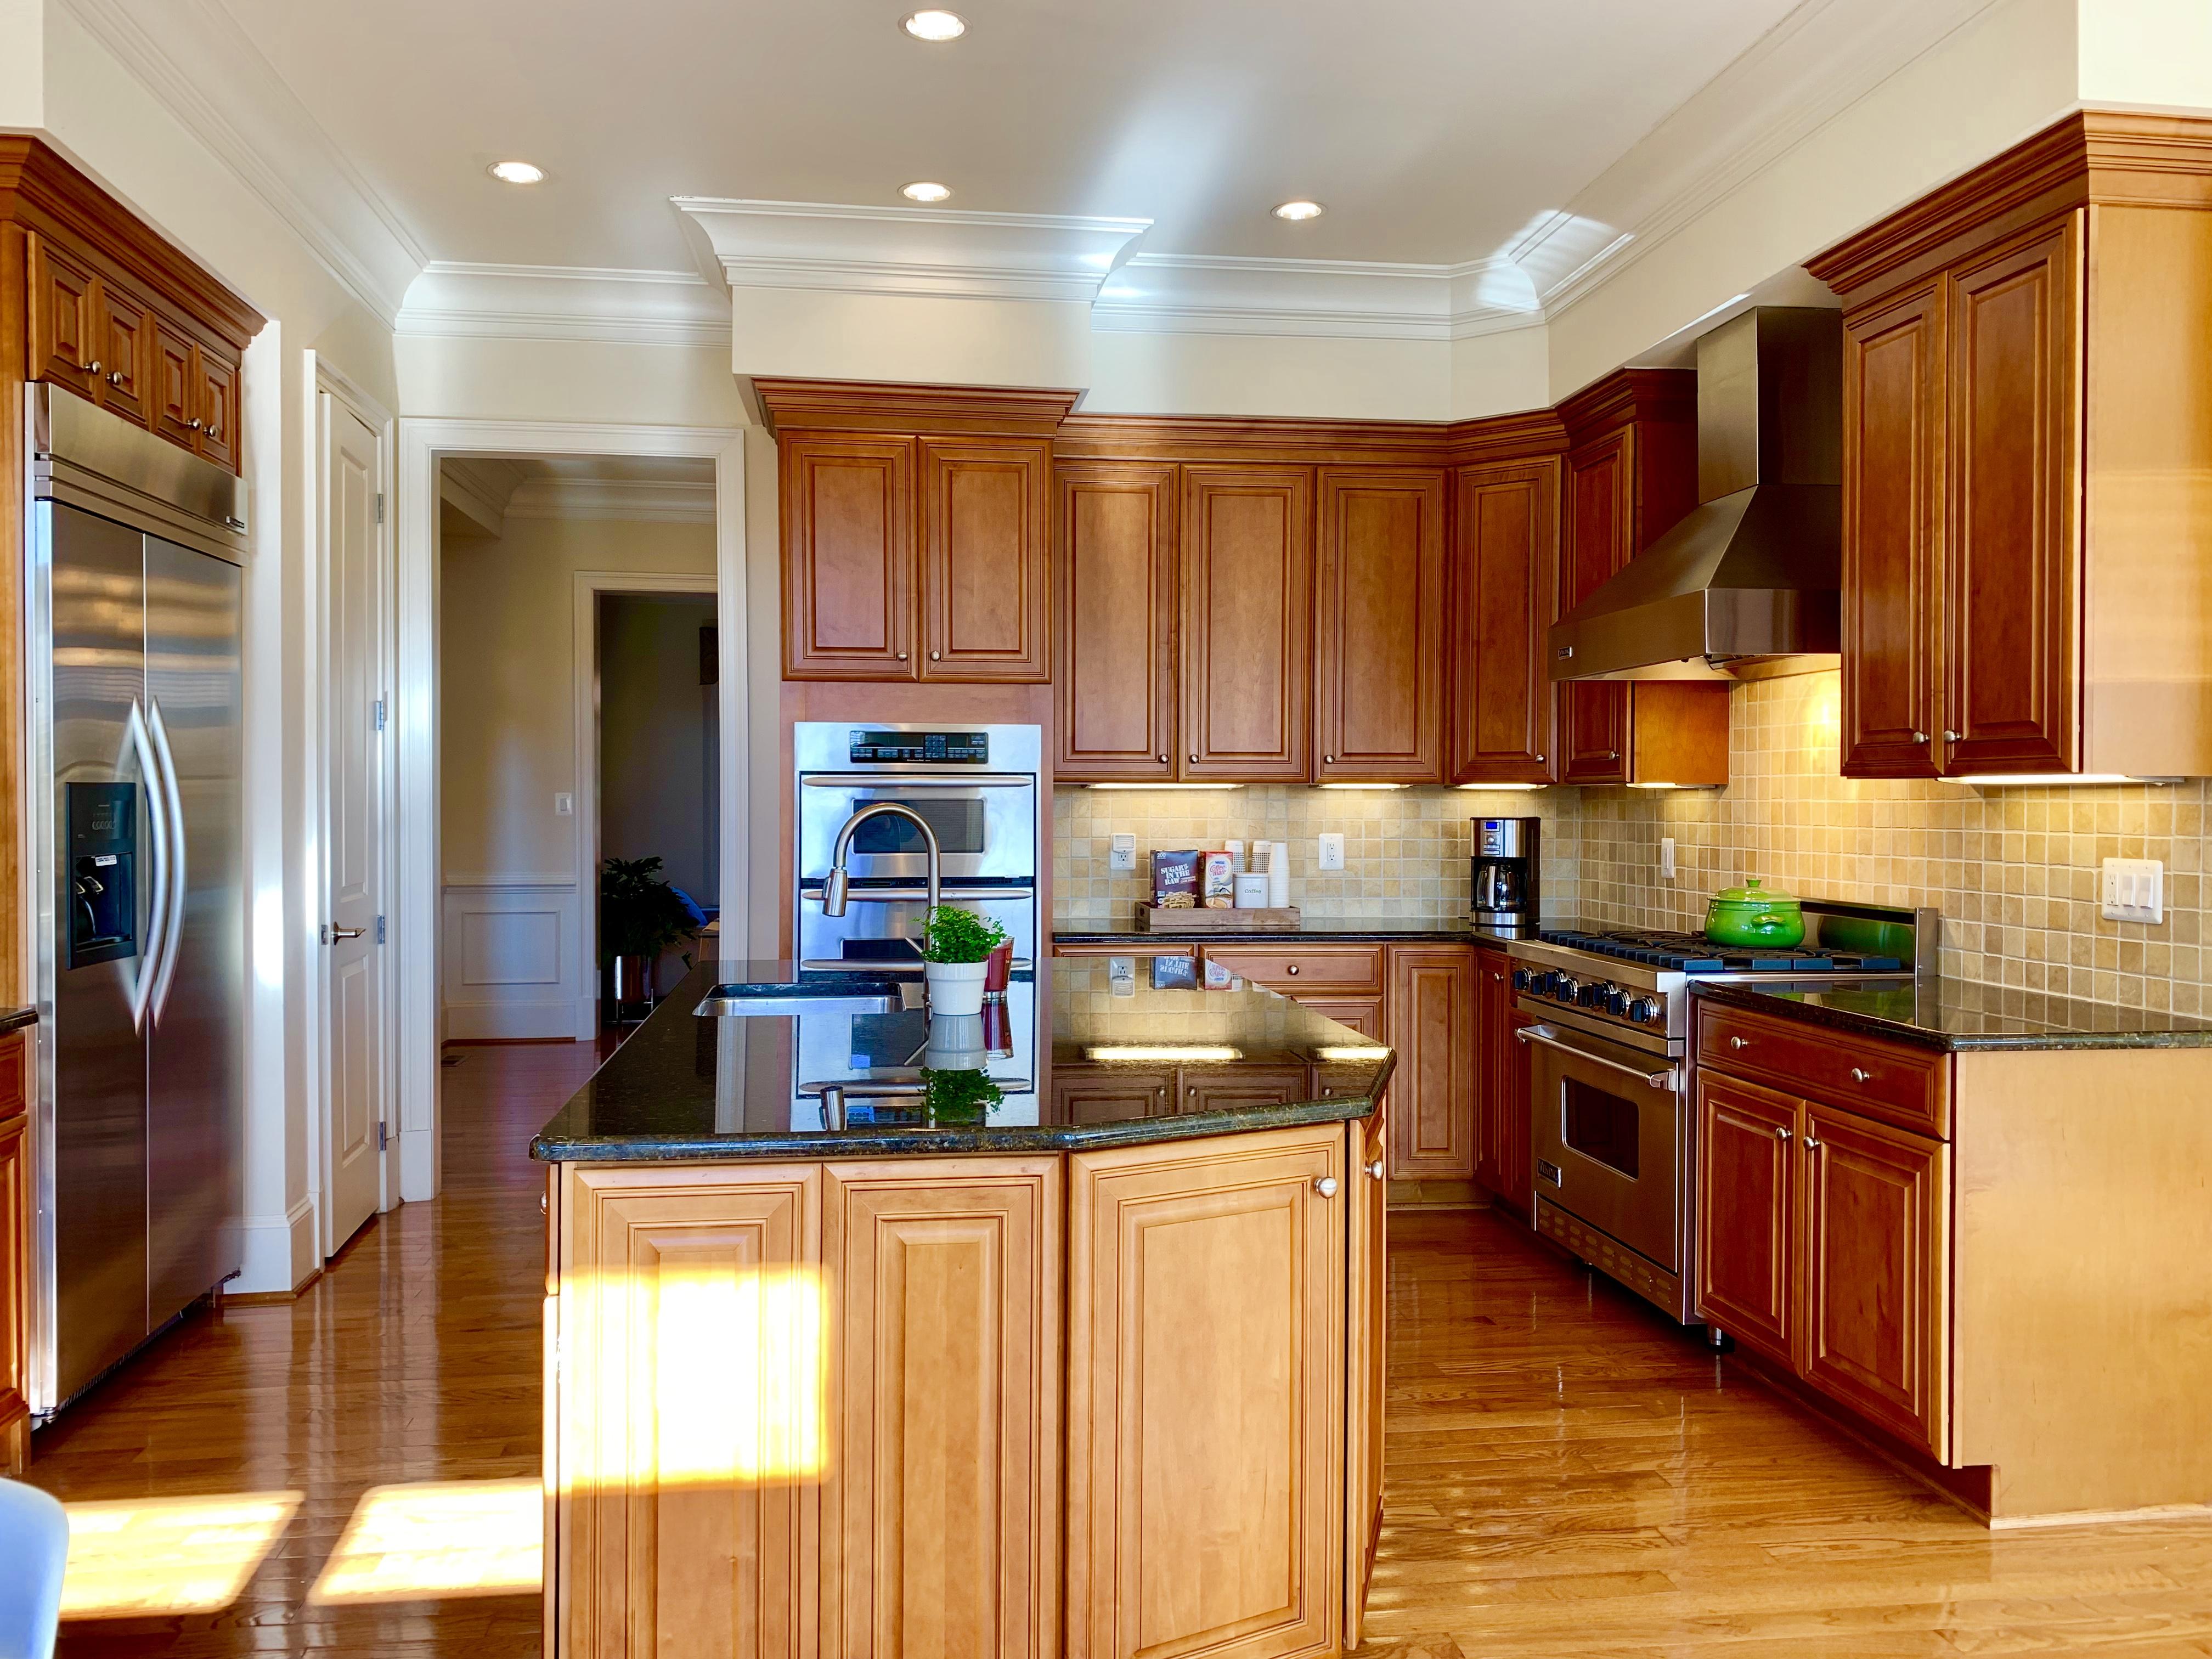 Washington, DC Homes With Gourmet Kitchen